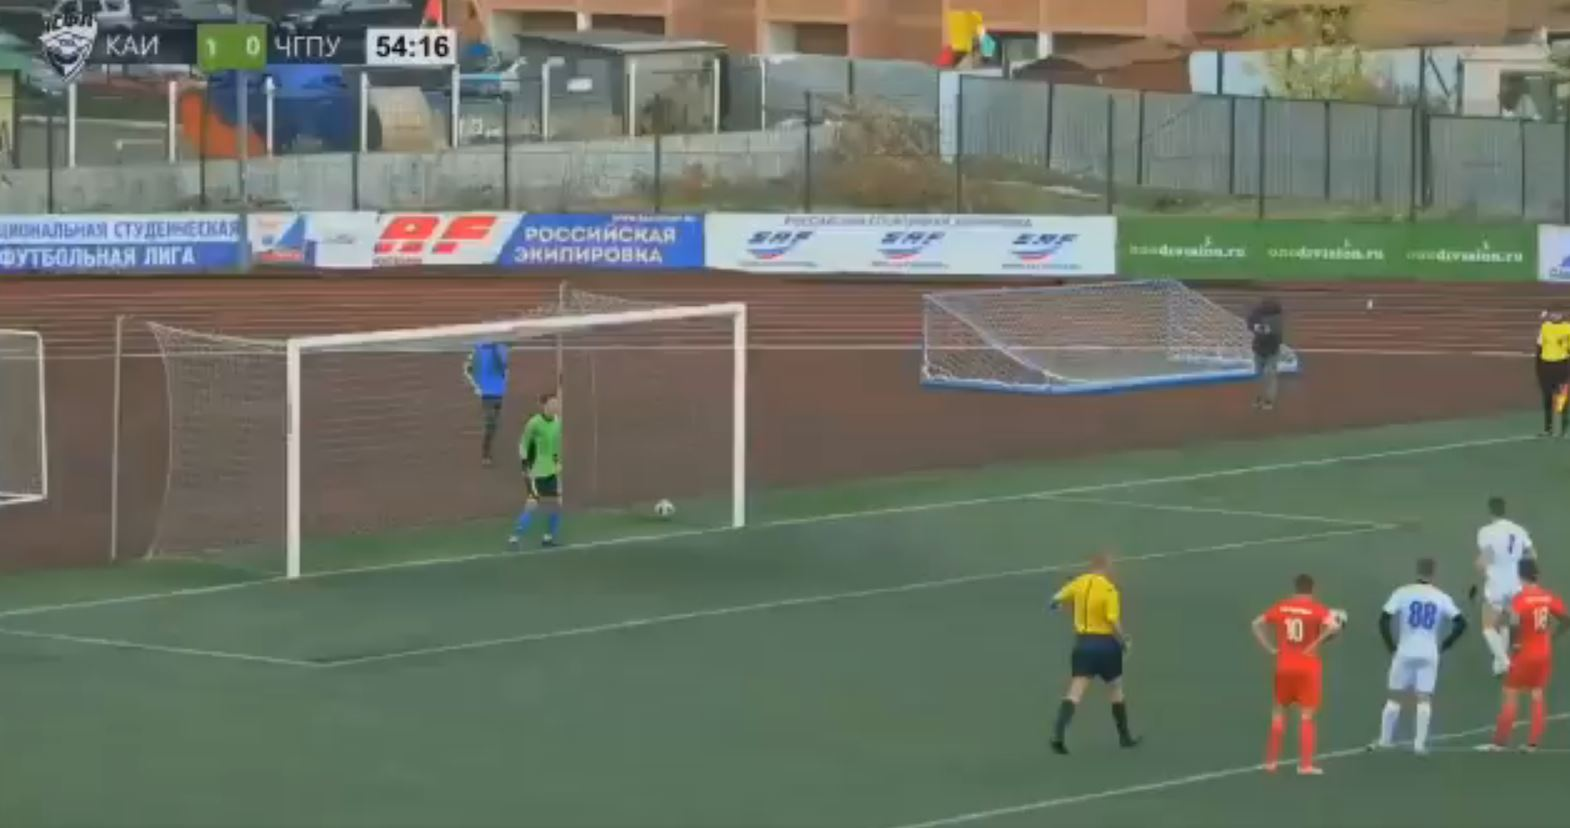 Fútbol Viral Rusia video penal